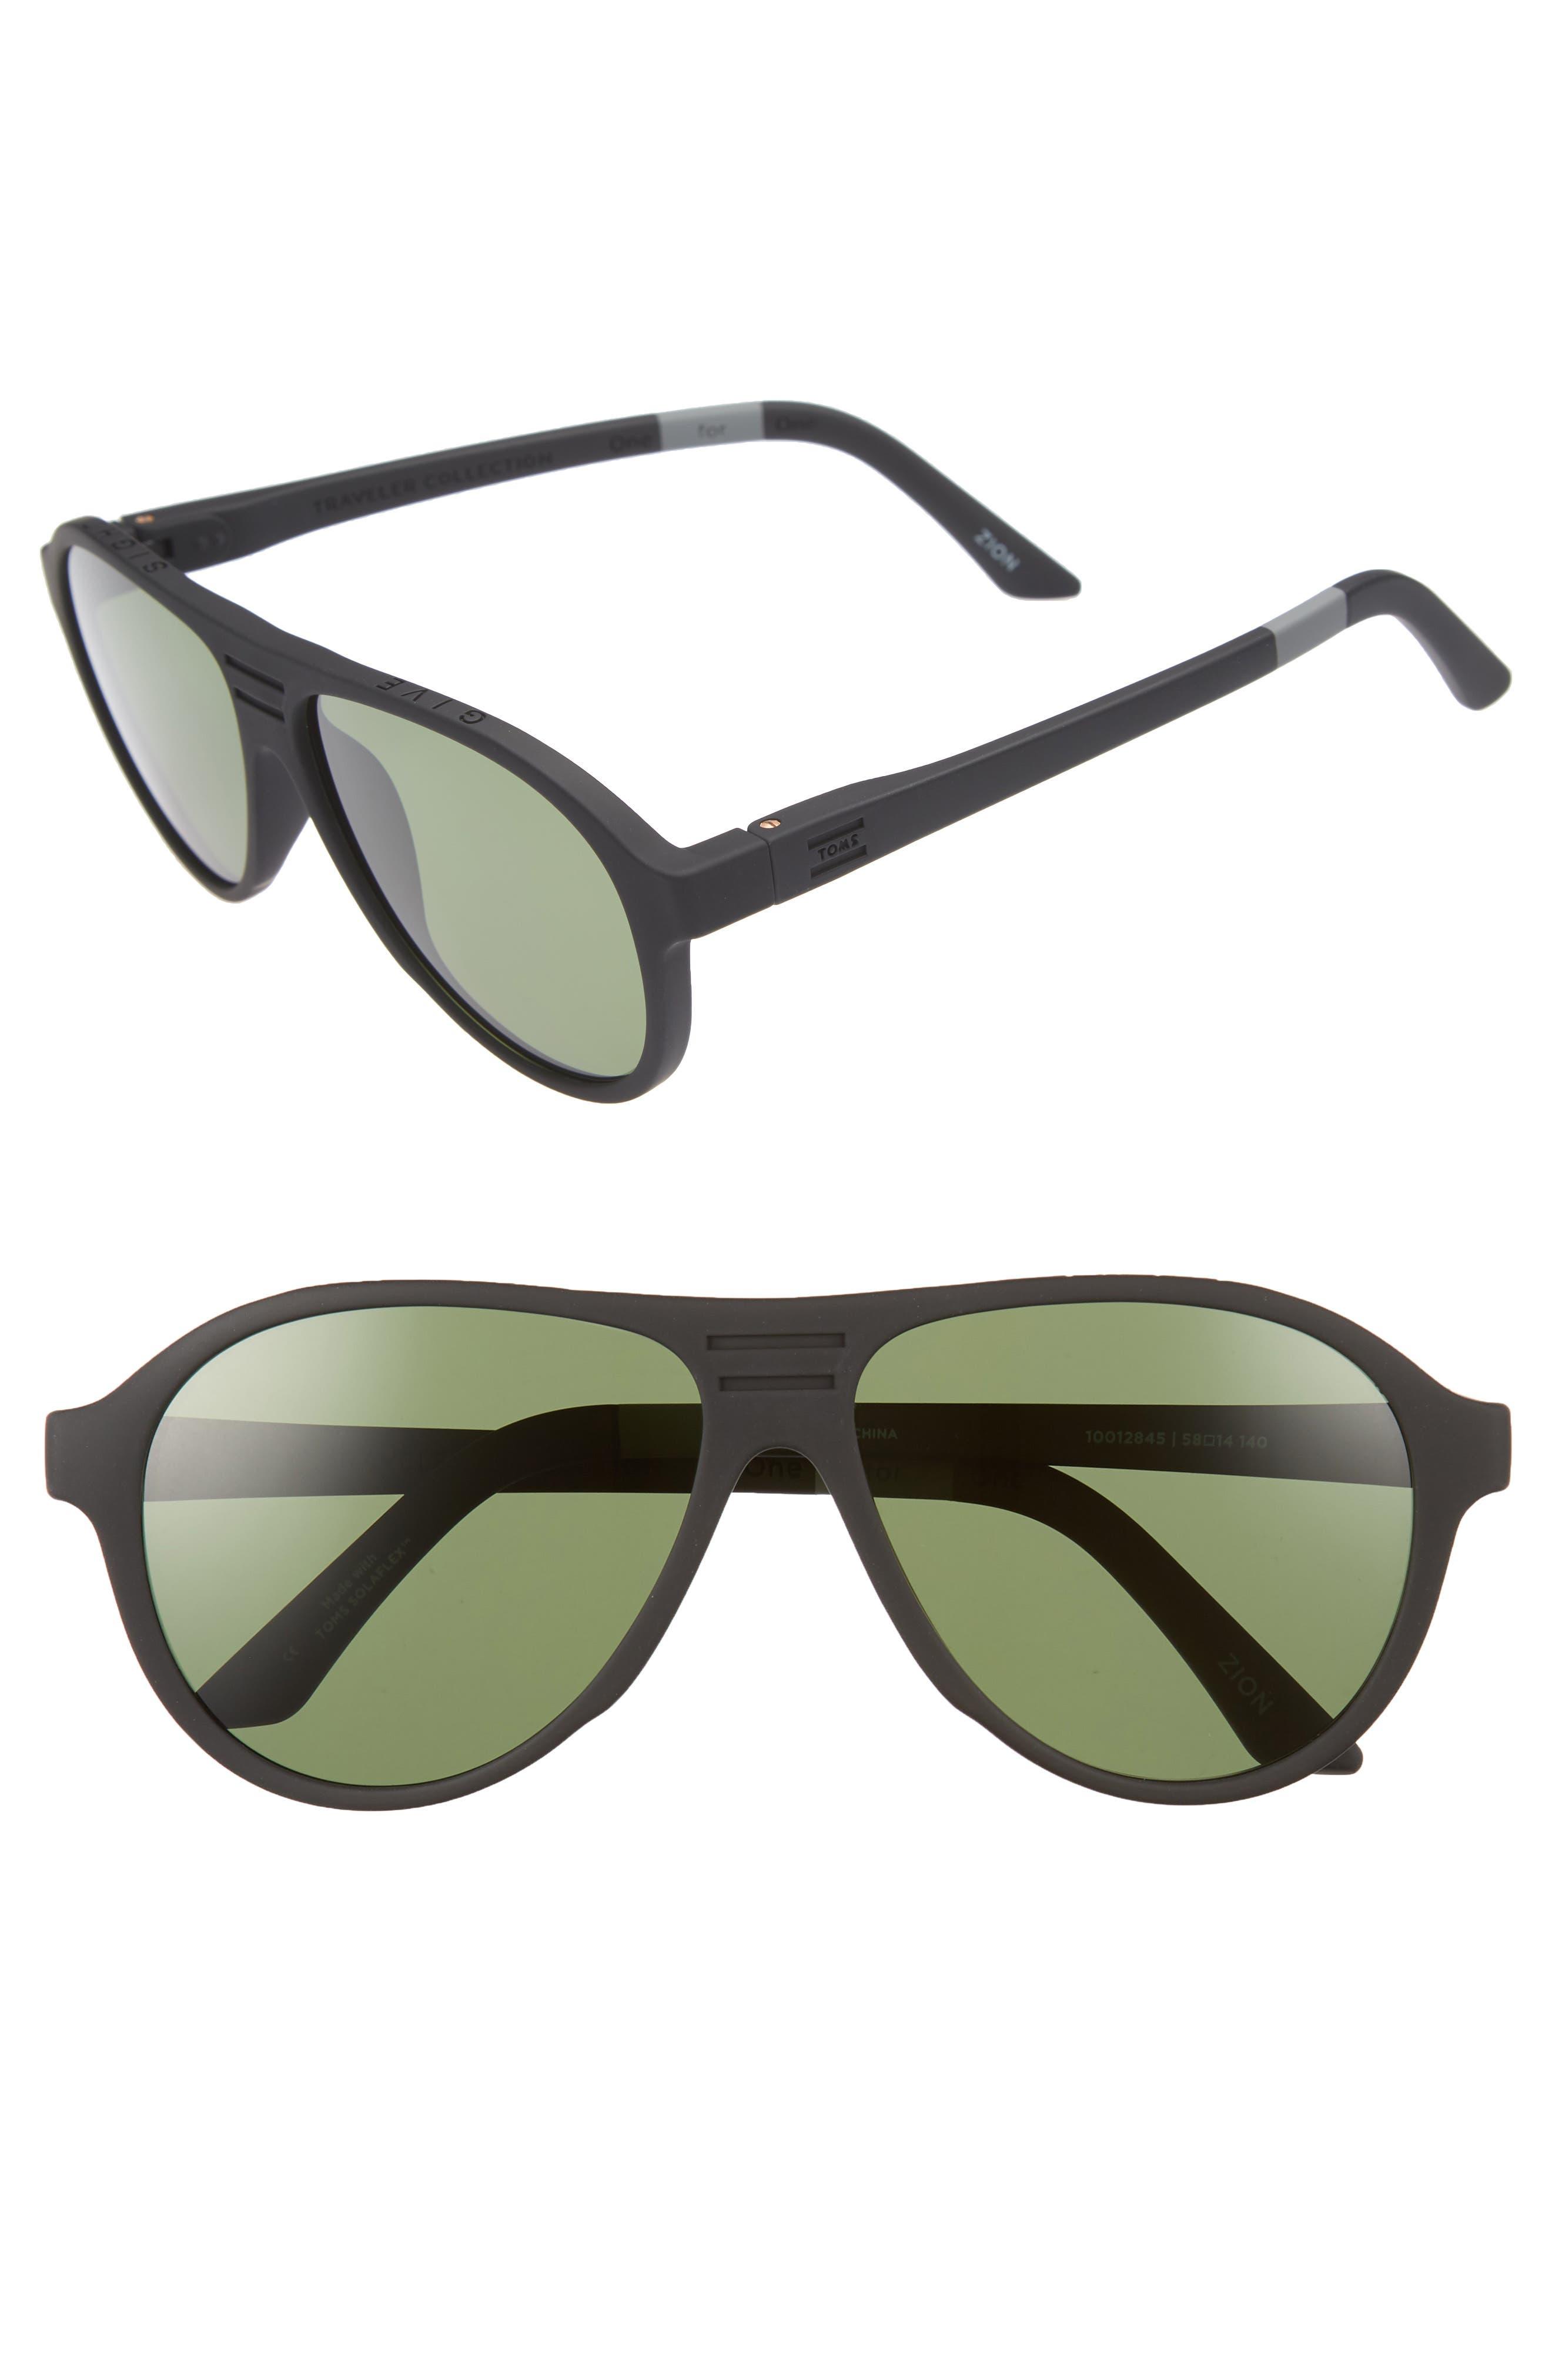 Traveler Zion 58mm Polarized Aviator Sunglasses,                         Main,                         color, Matte Black/ Bottle Green